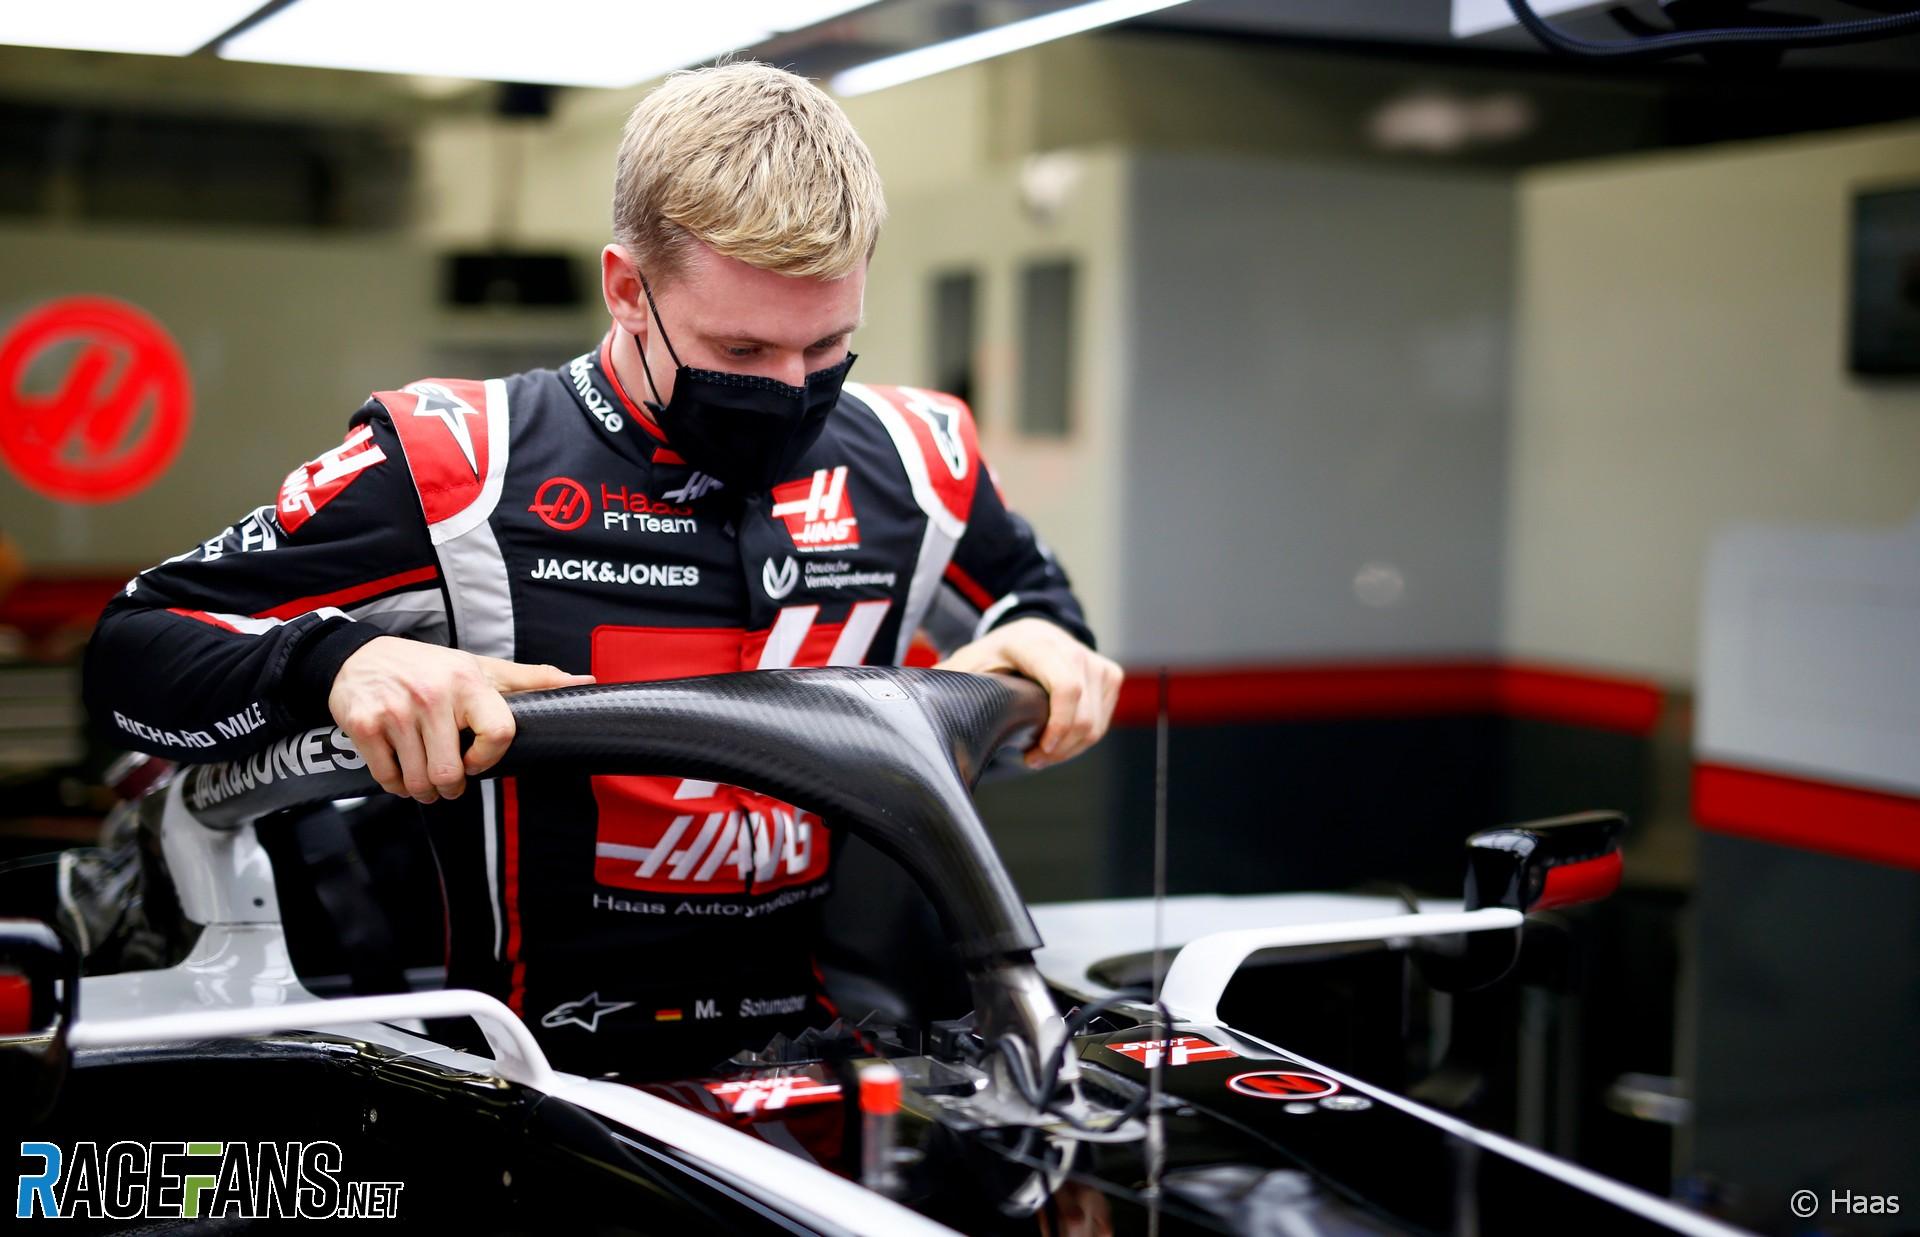 Mick Schumacher, Haas, Bahrain International Circuit, 2020